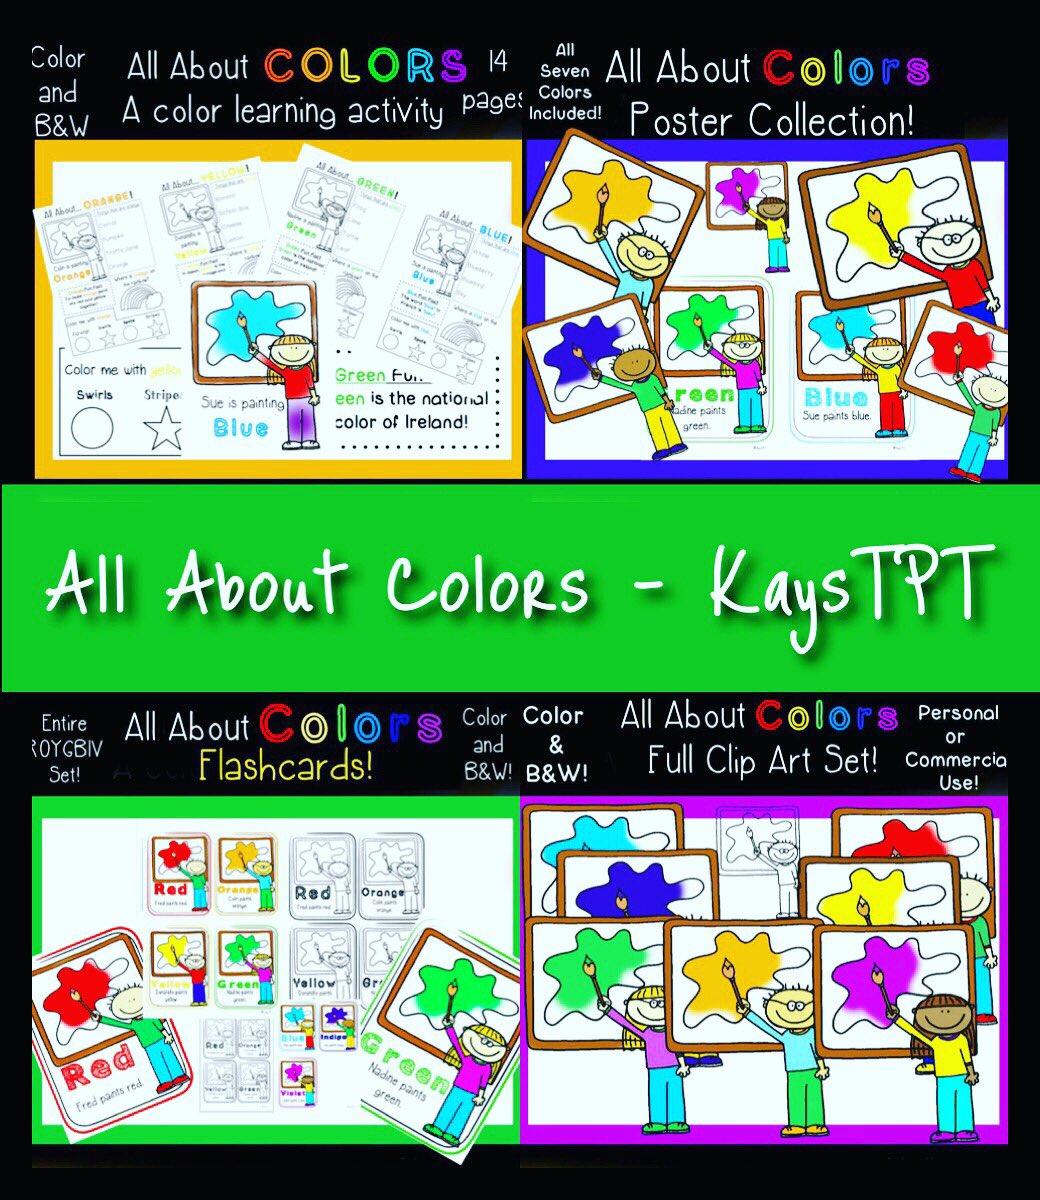 teachingcolors hashtag on Twitter